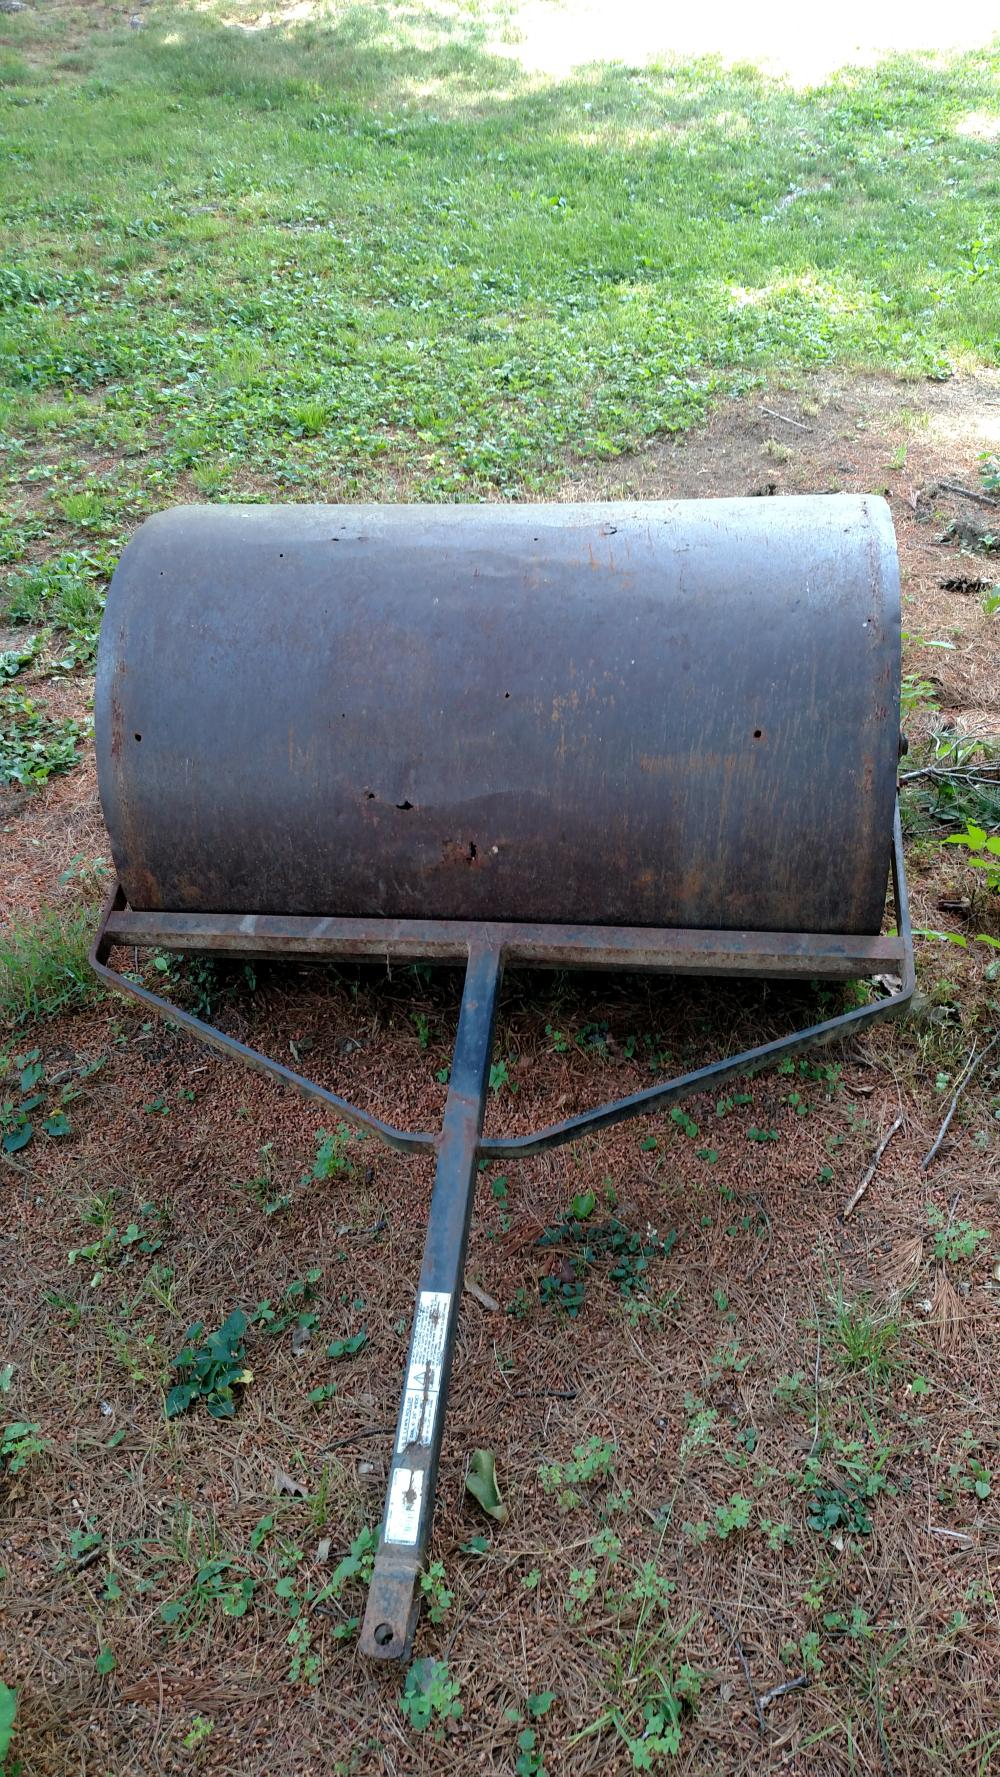 metal lawn roller (has holes in it)